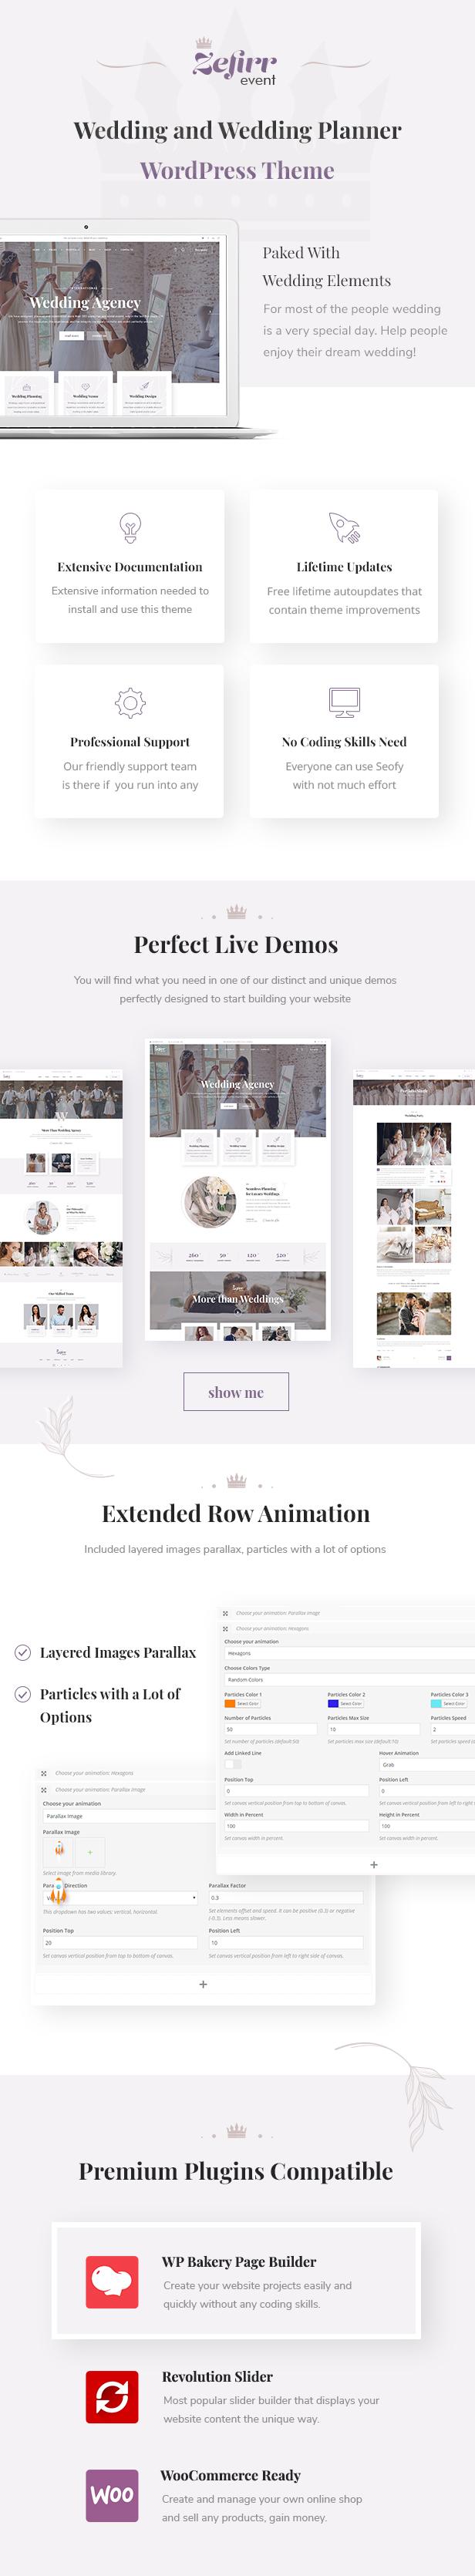 Zefirr - Event & Wedding Agency WP Theme - 1